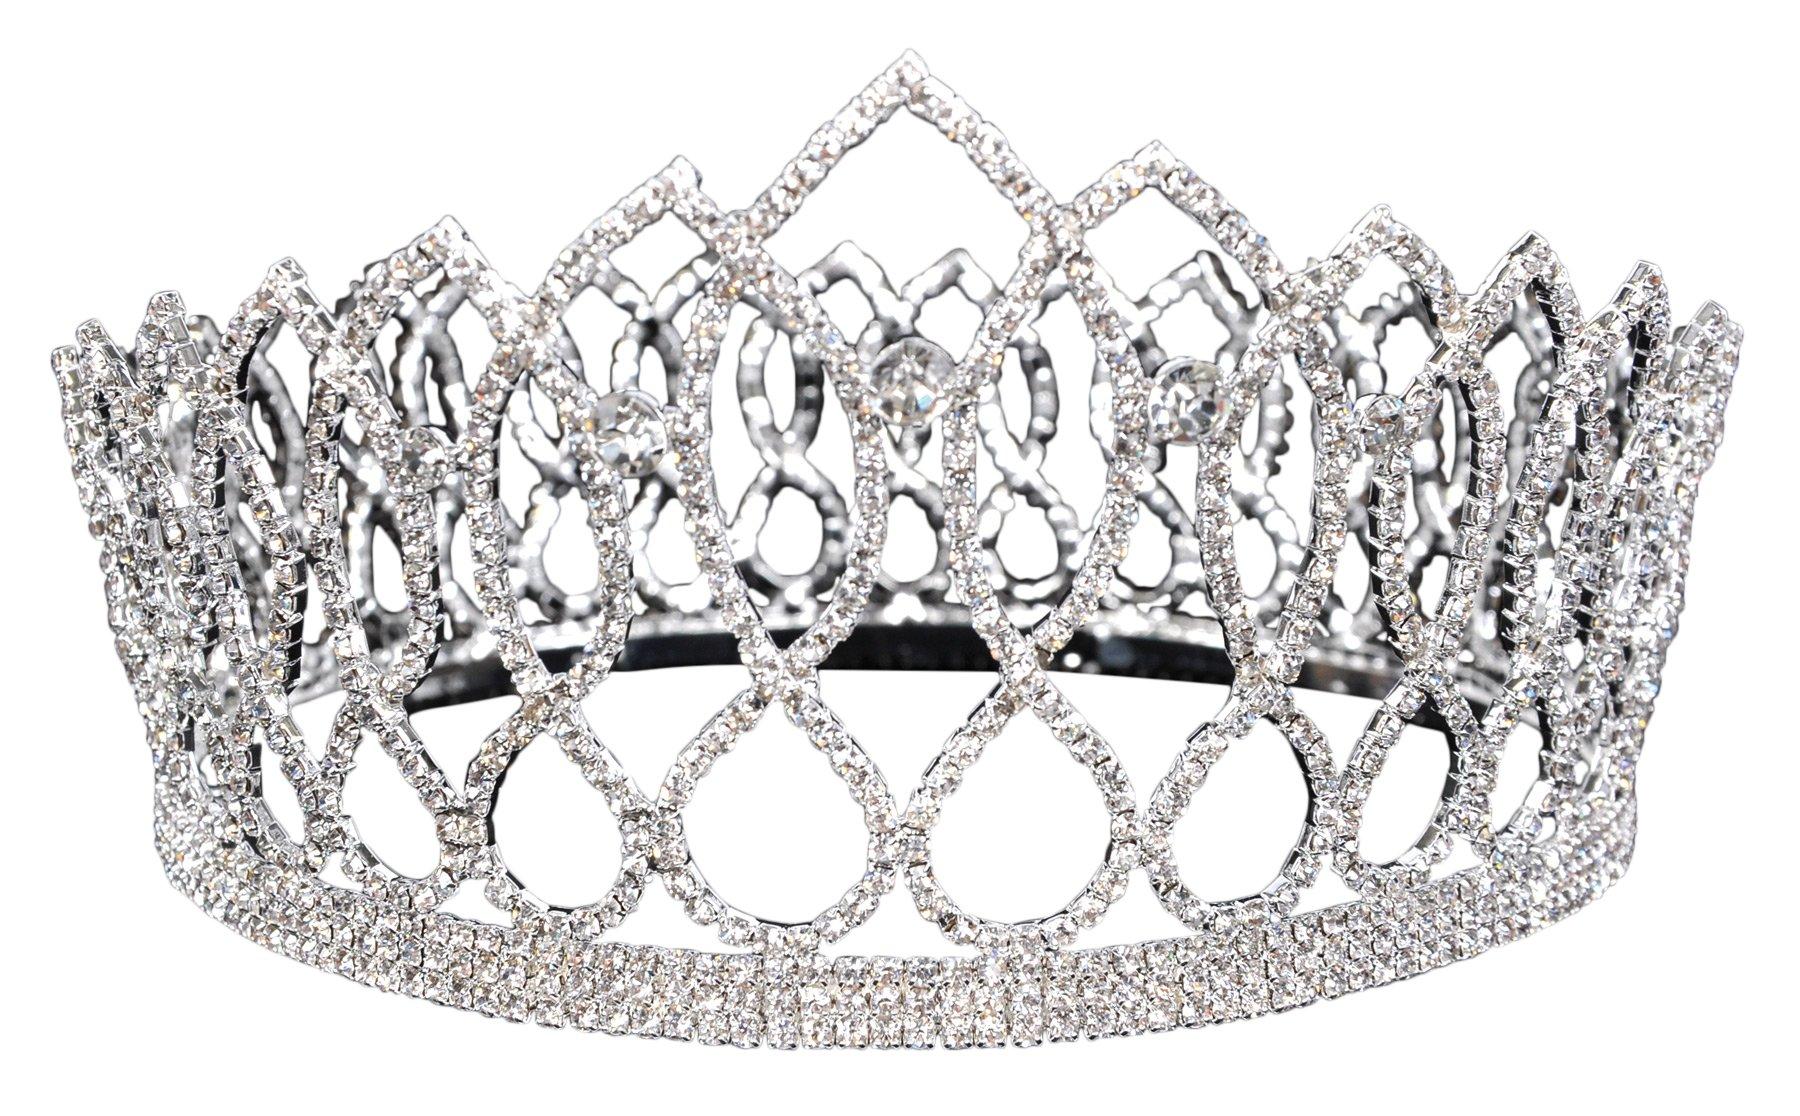 UHC King 4'' Rhinestone Heart Bridal Wedding Prom Tiara Crown Costume Accessory